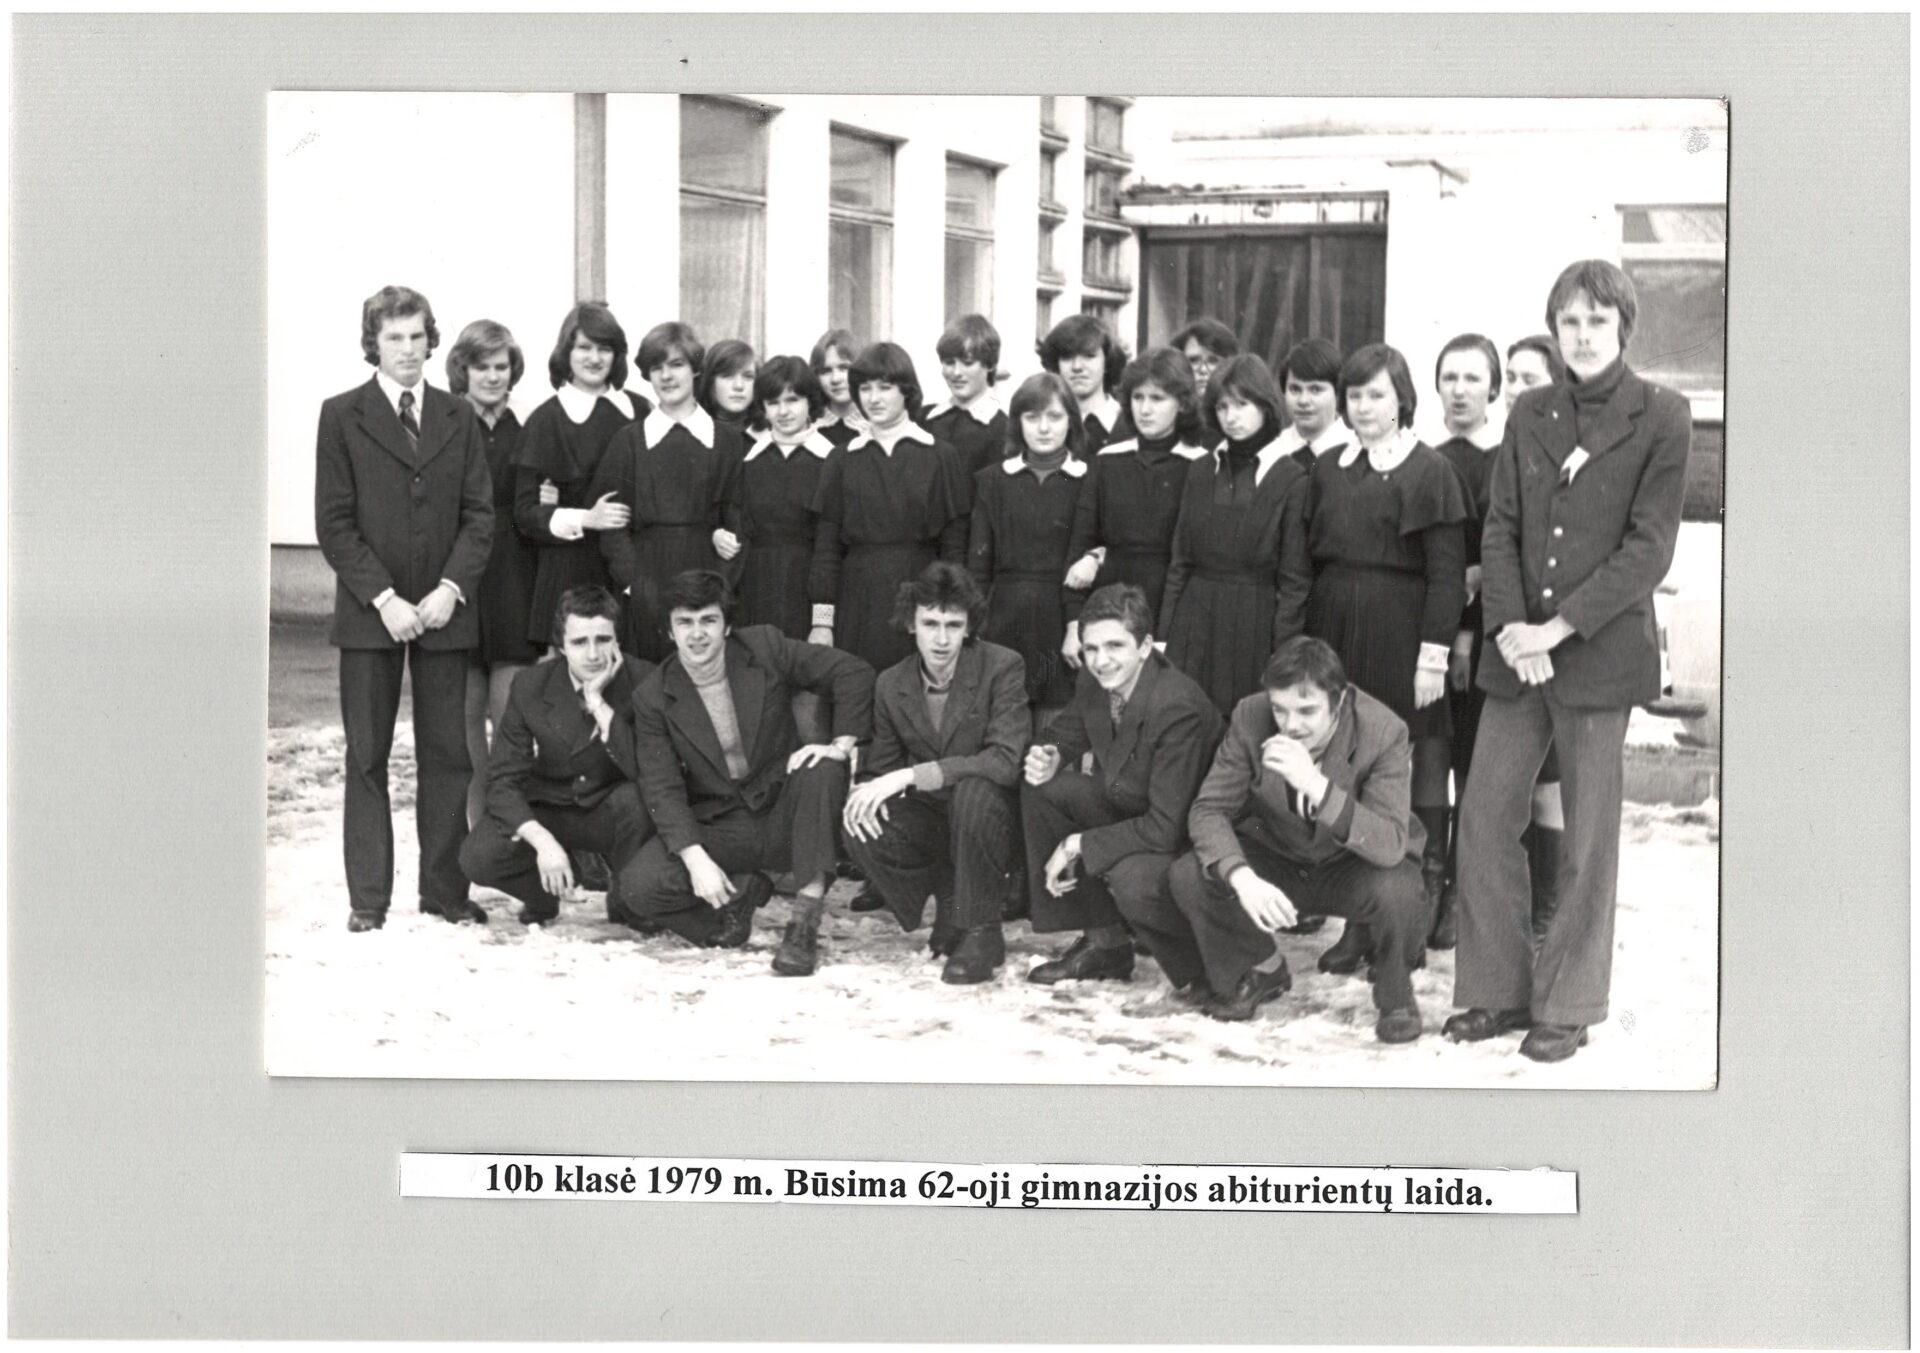 Būsima 62 laida, 1979 m.